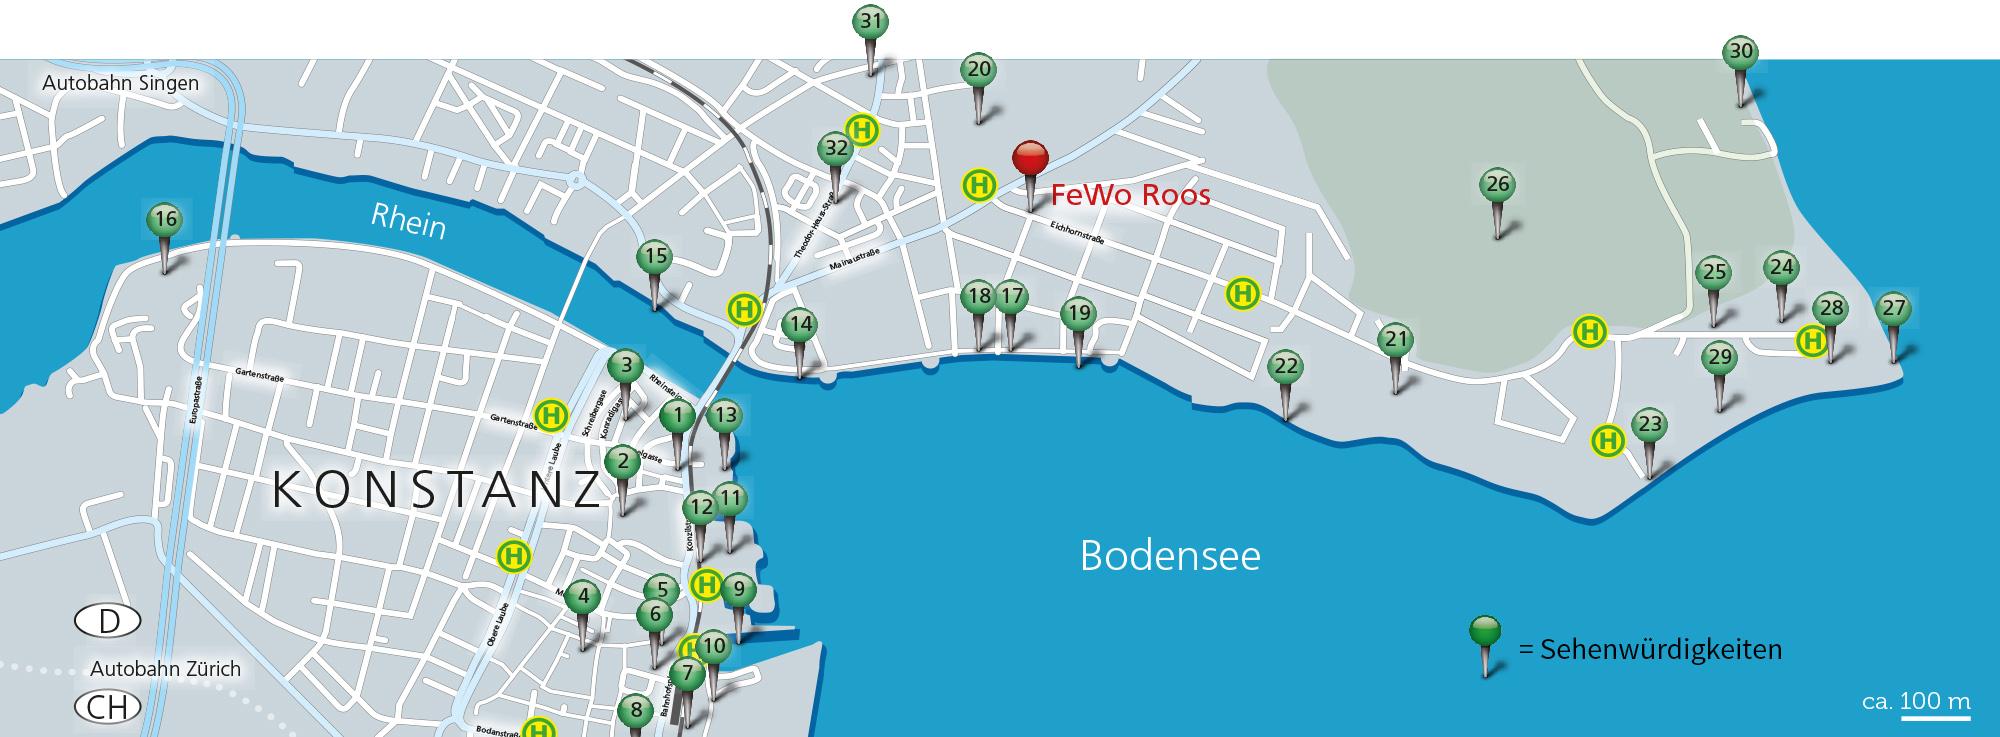 Stadtplan Konstanz am Bodensee der Fewo Roos